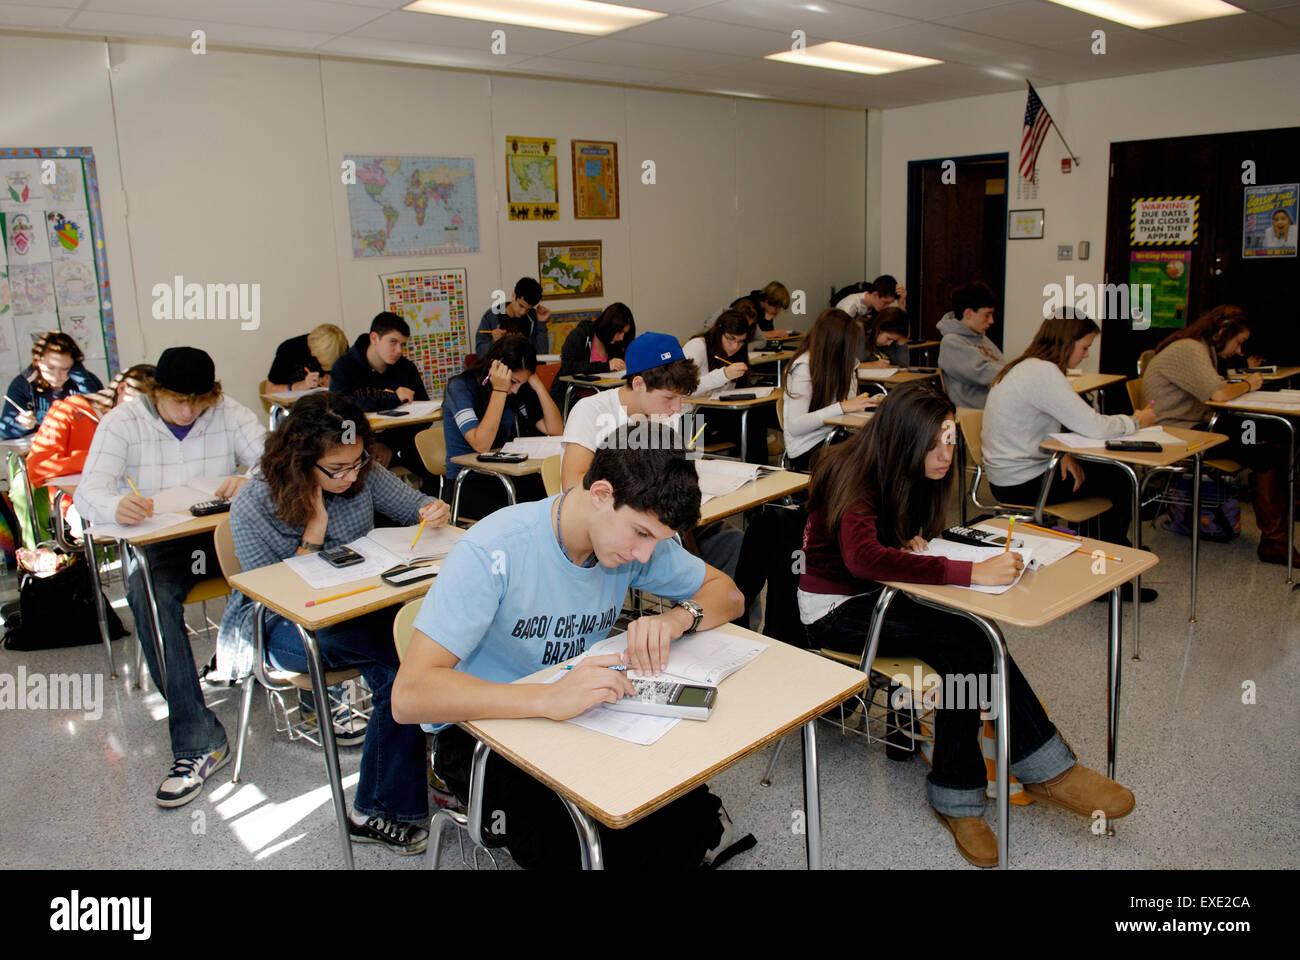 Students In High School Classroom Taking A Standardized